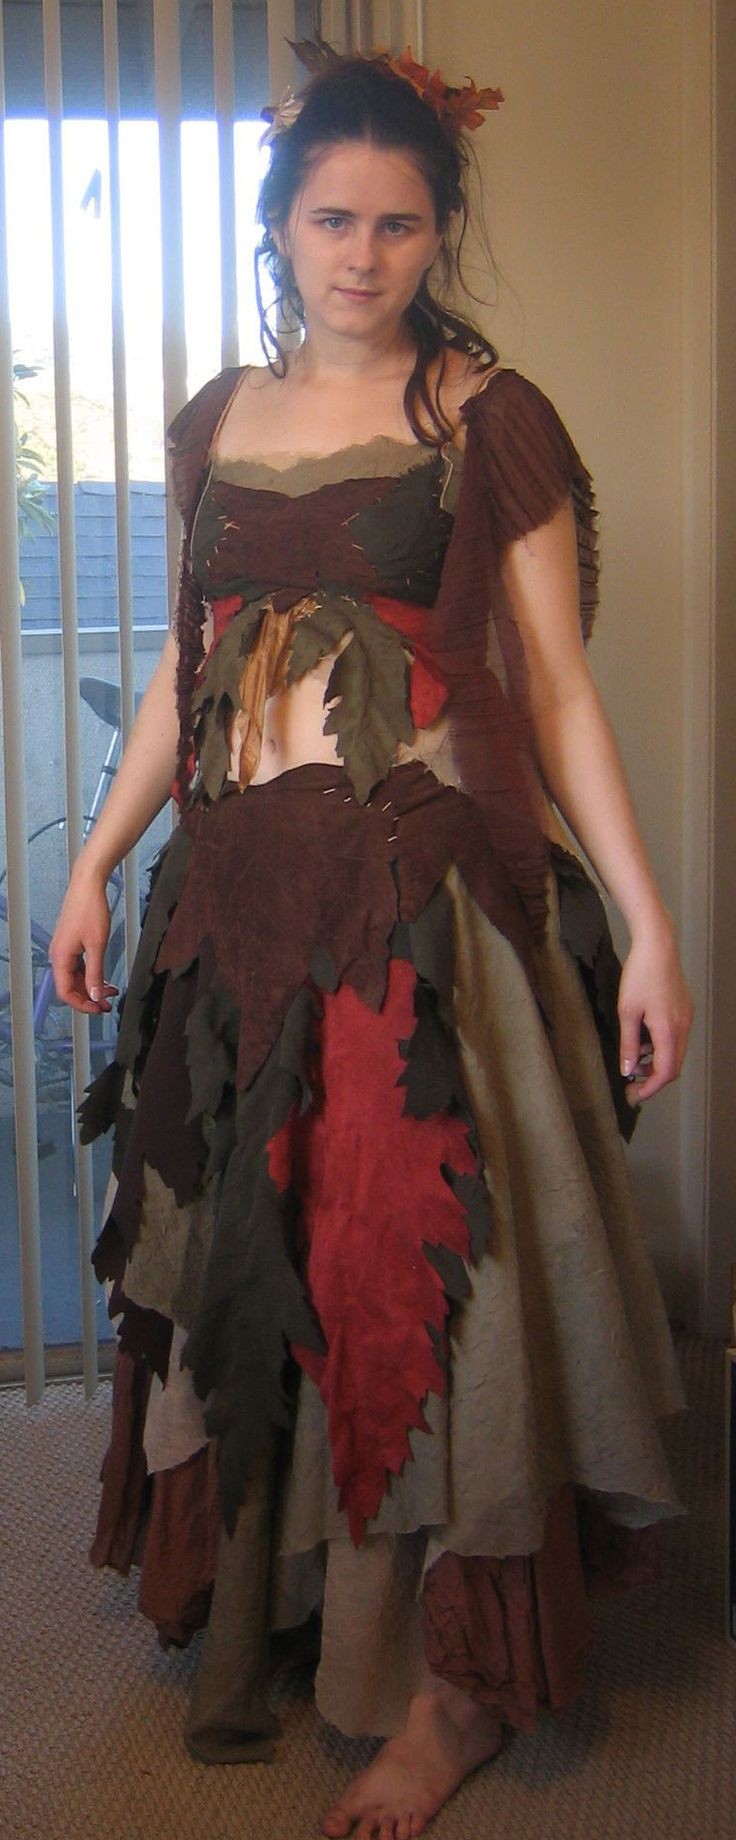 Best 20+ Nymph costume ideas on Pinterest | Wood elf costume ...